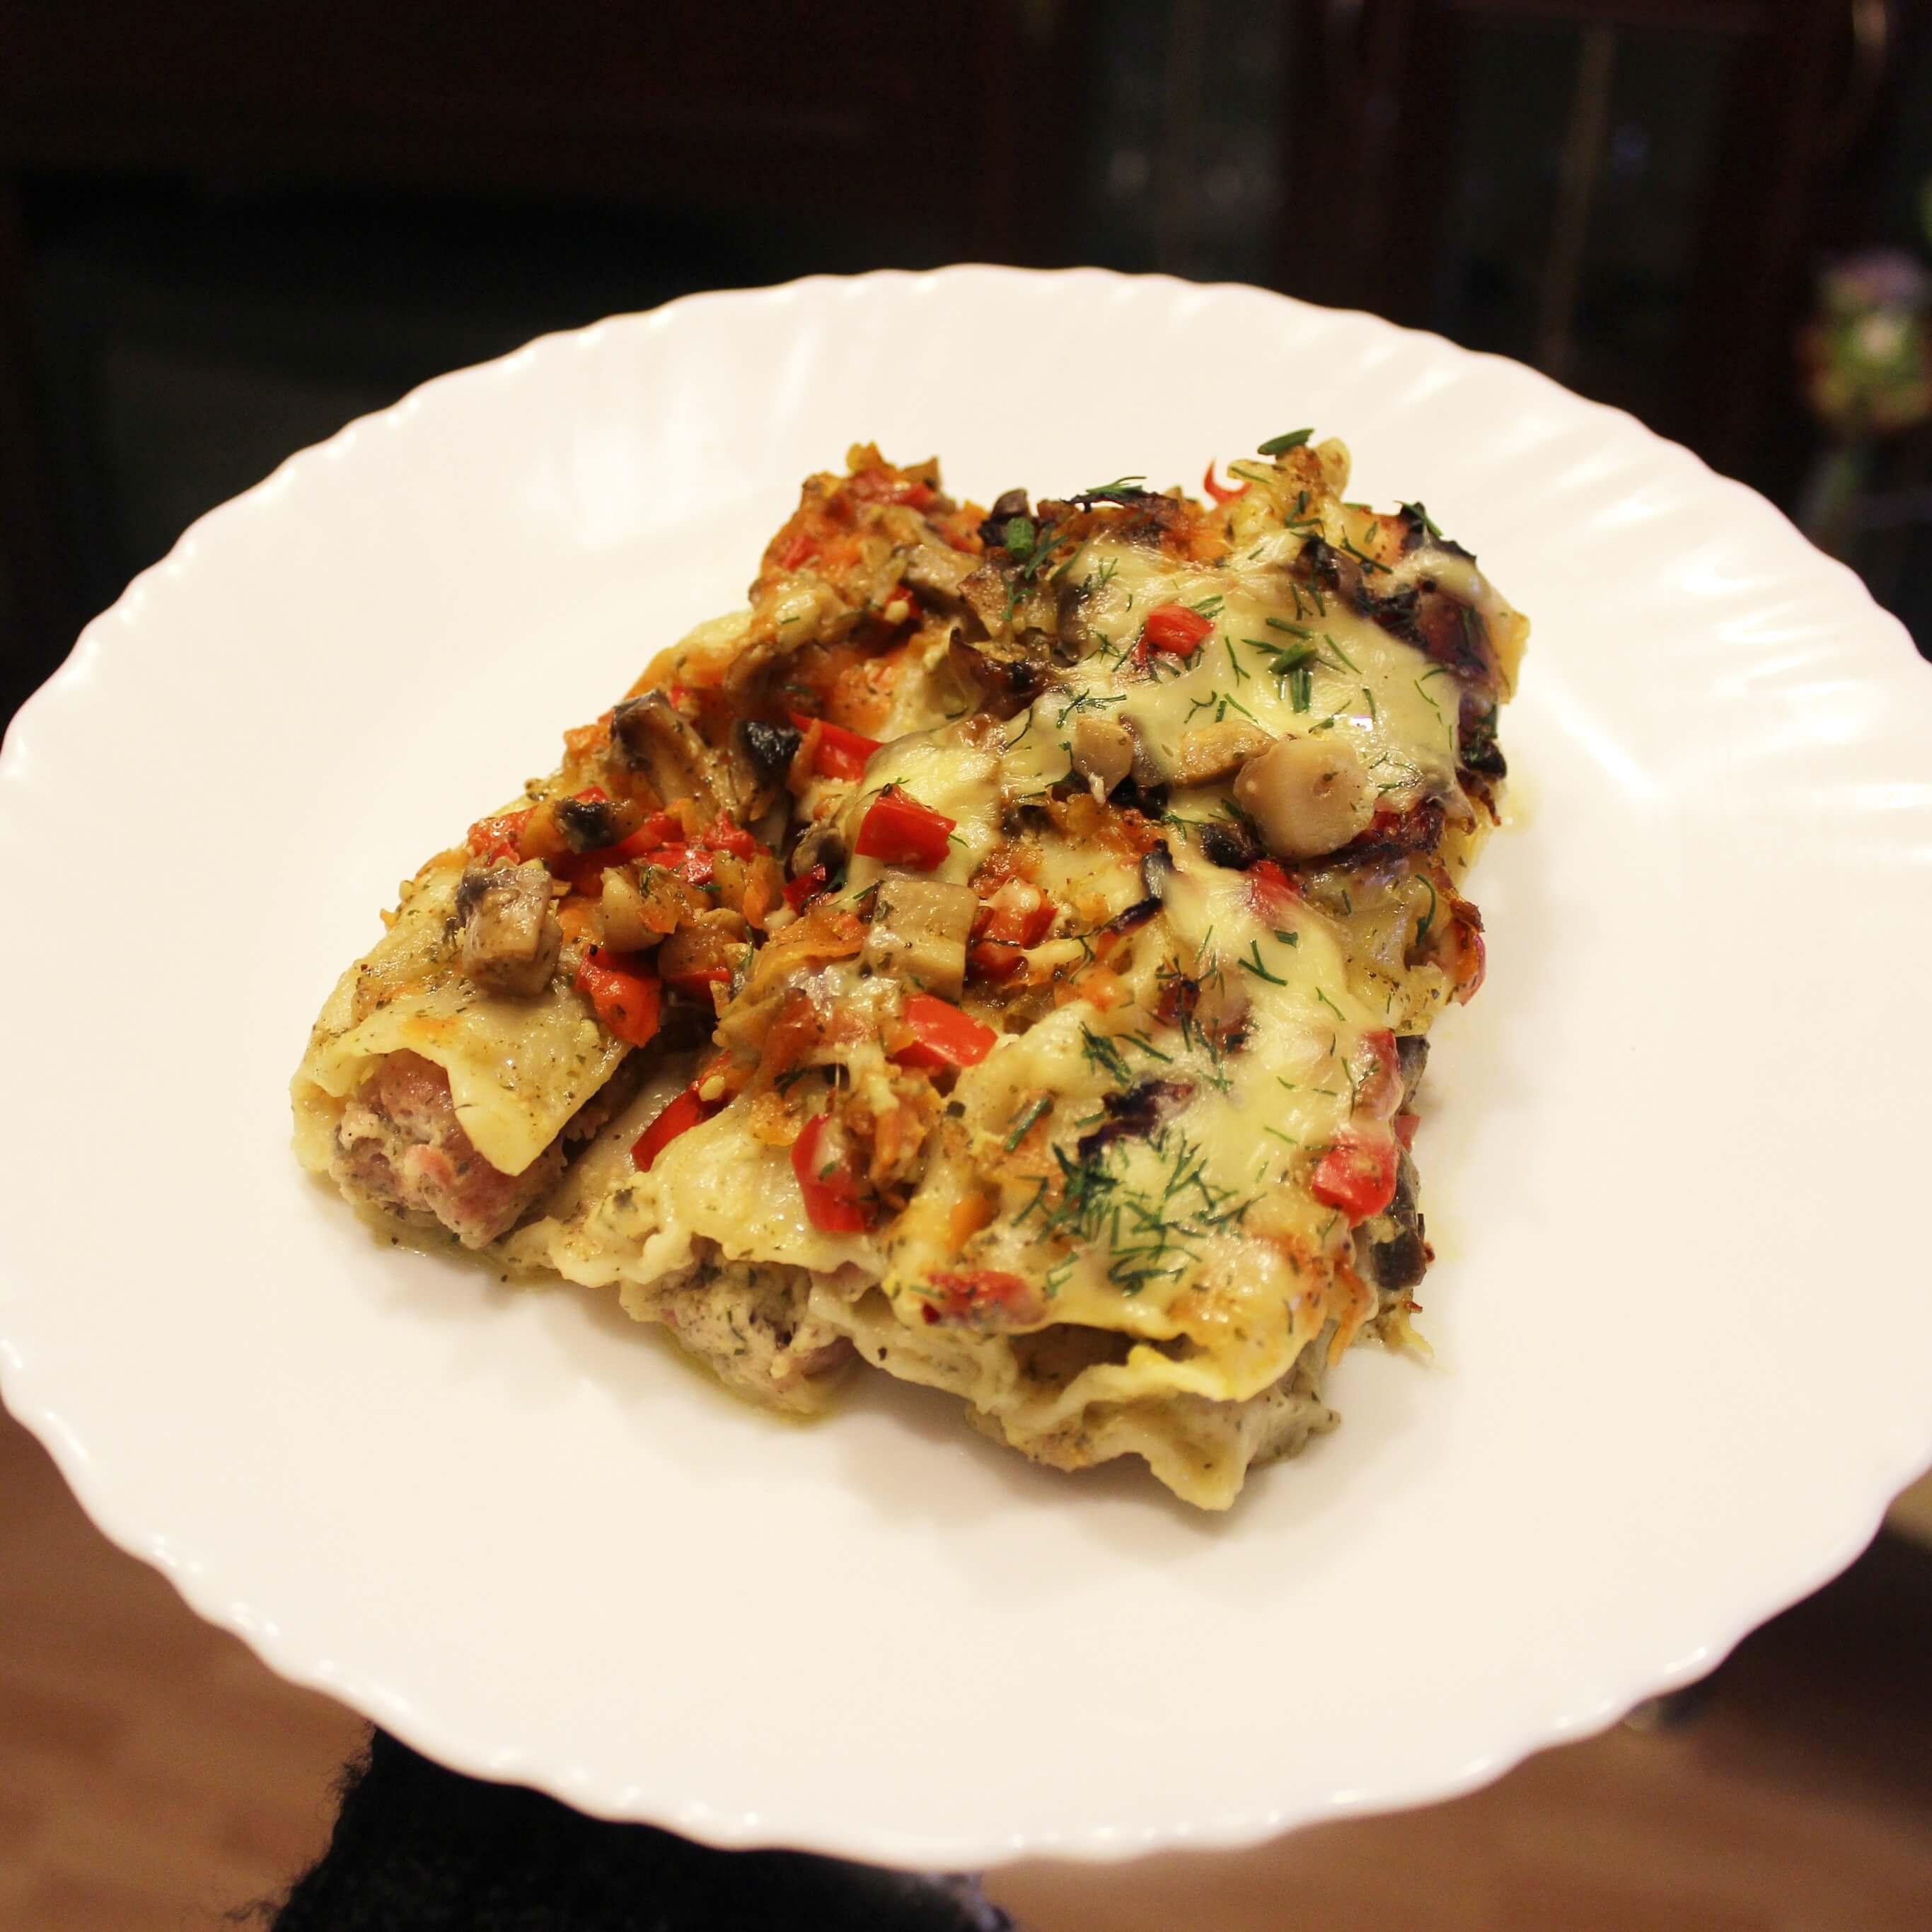 Cannelloni makaronų apkepas